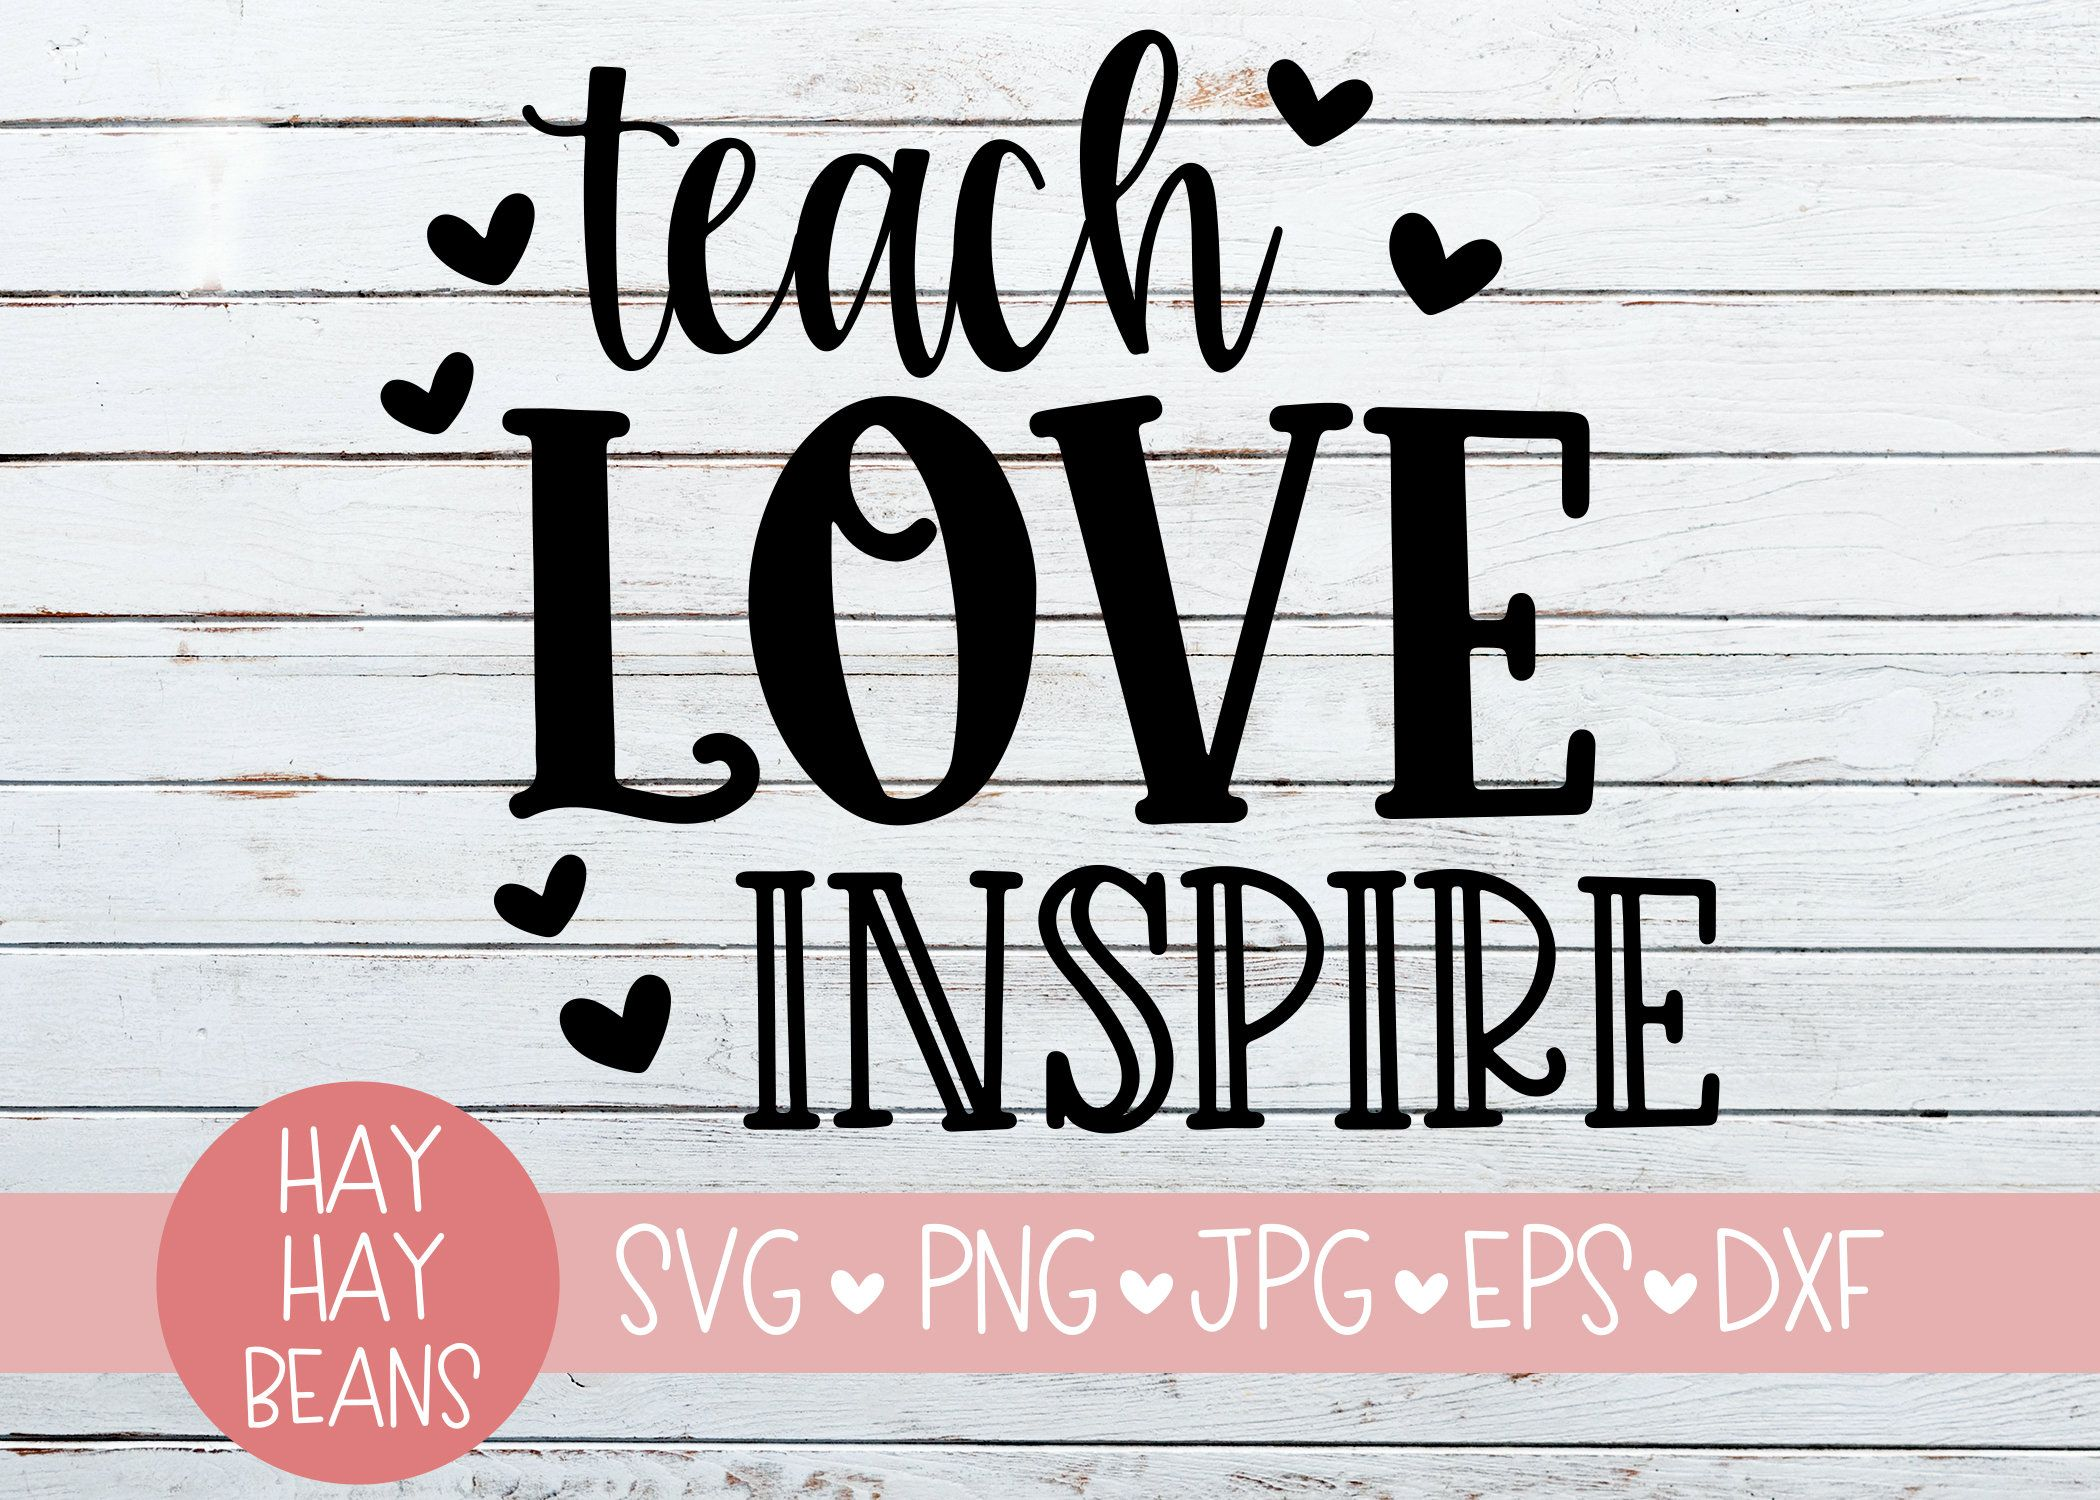 Download Teach Love Inspire SVG | teacher svg, png, jpg, eps, dxf ...